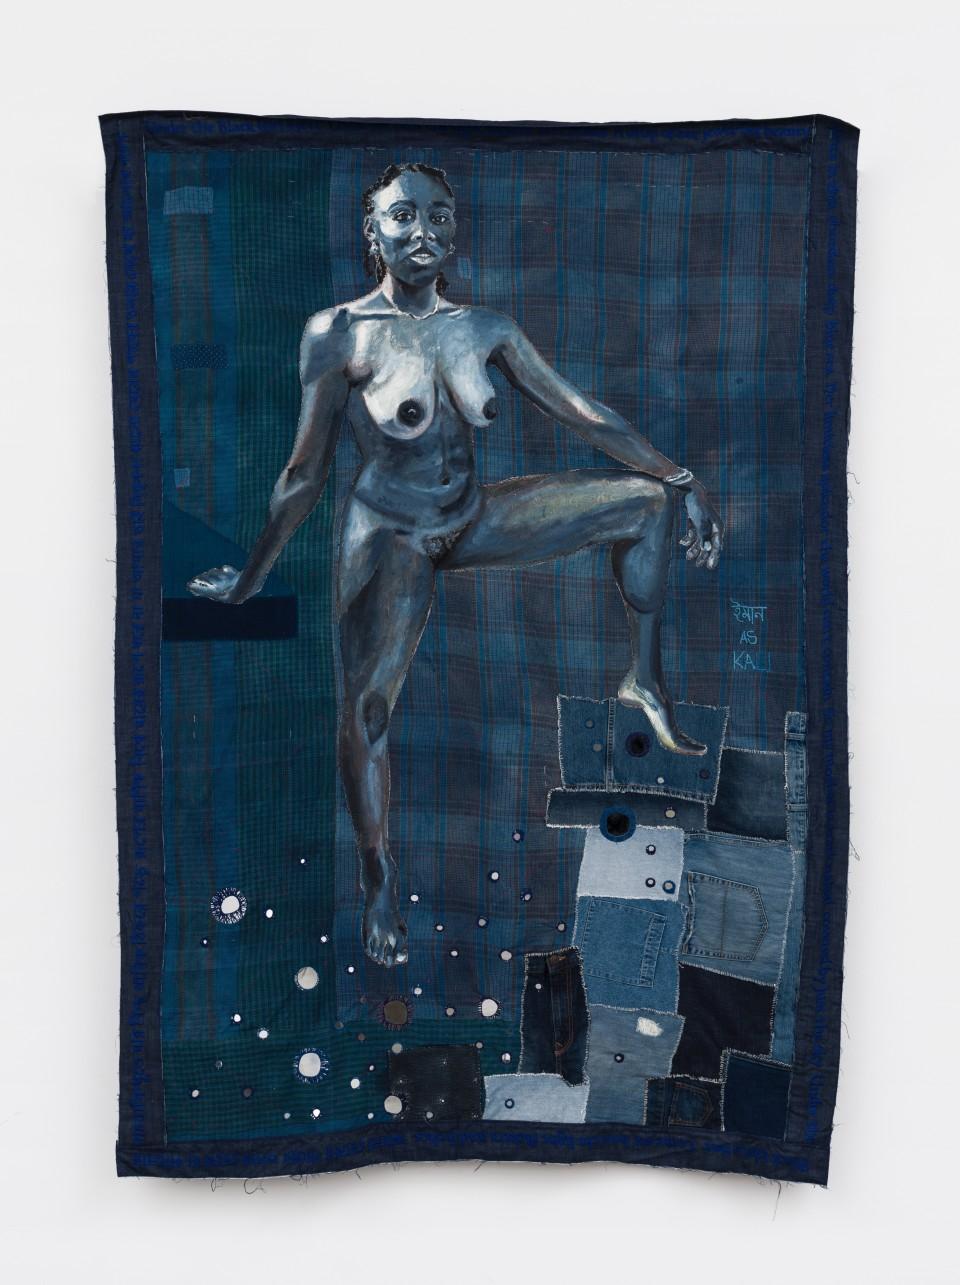 Image: Bhasha Chakrabarti To be so Black and Blue (Iman as Kali), 2021 used clothing, thread, oil, indigofera tinctoria, mirrors, and song by Kazi Nazrul Islam 87 x 60 inches (BCh.21.003.86)